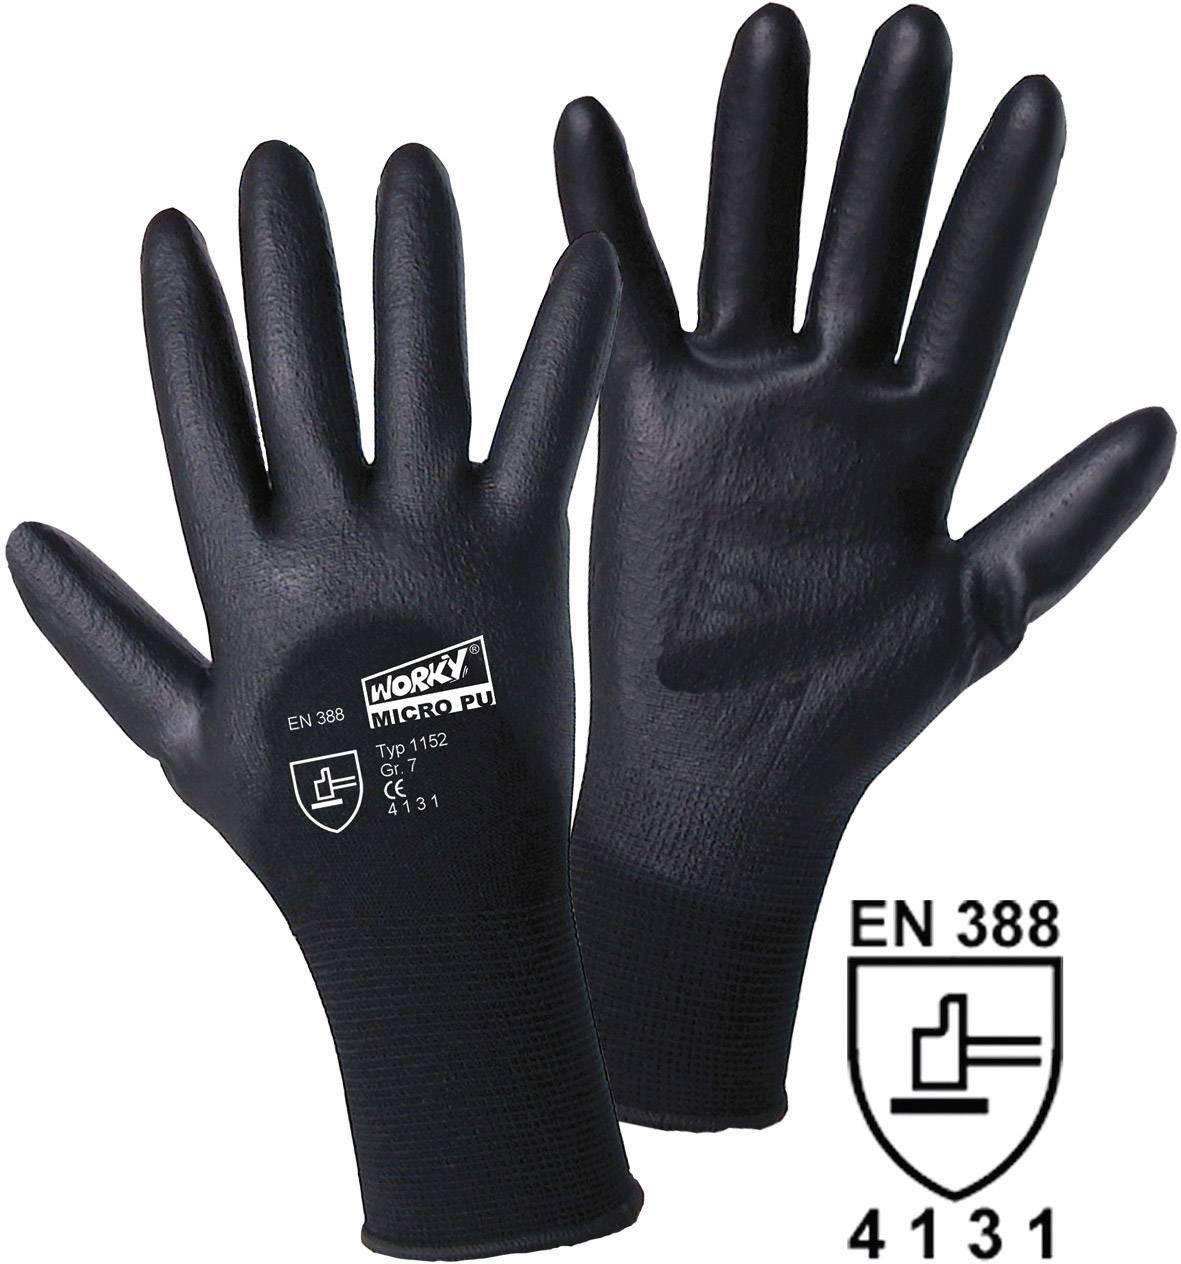 Pracovné rukavice worky MICRO black 1152, velikost rukavic: 9, L